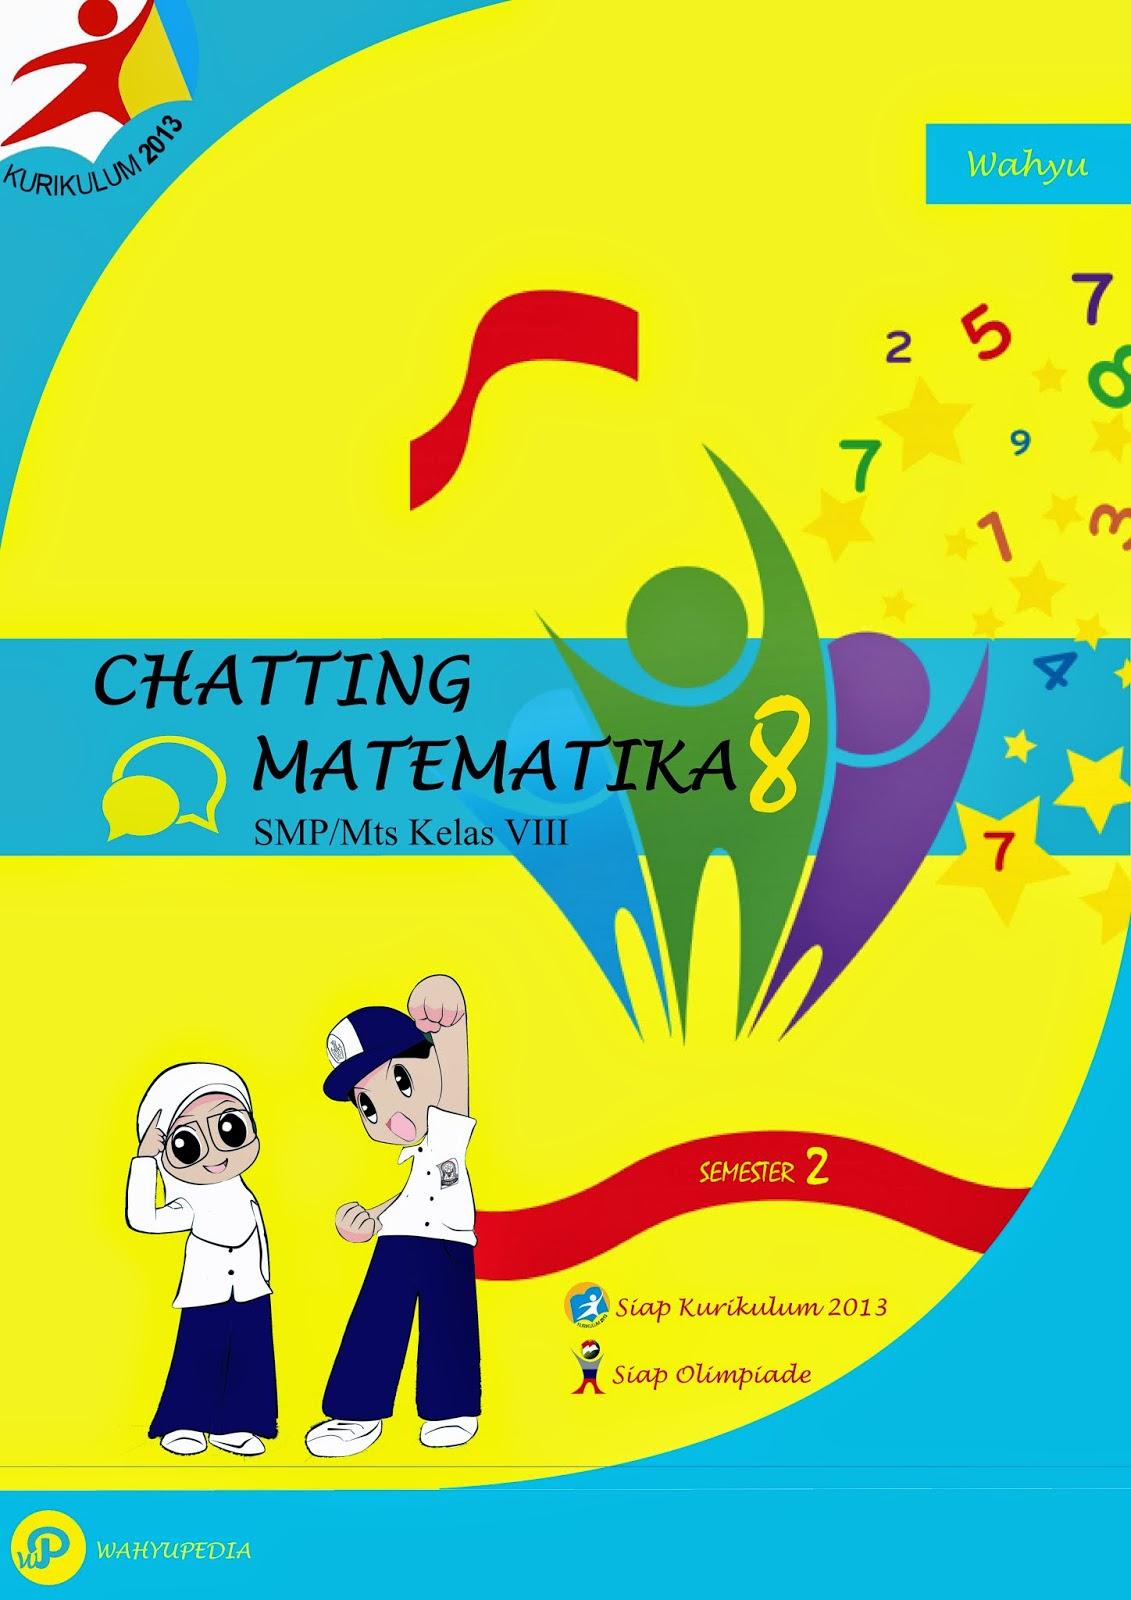 Pembahasan Lengkap Matematika Smp Kelas 8 Kurikulum 2013 Semester 2 Smp Negeri 1 Situbondo